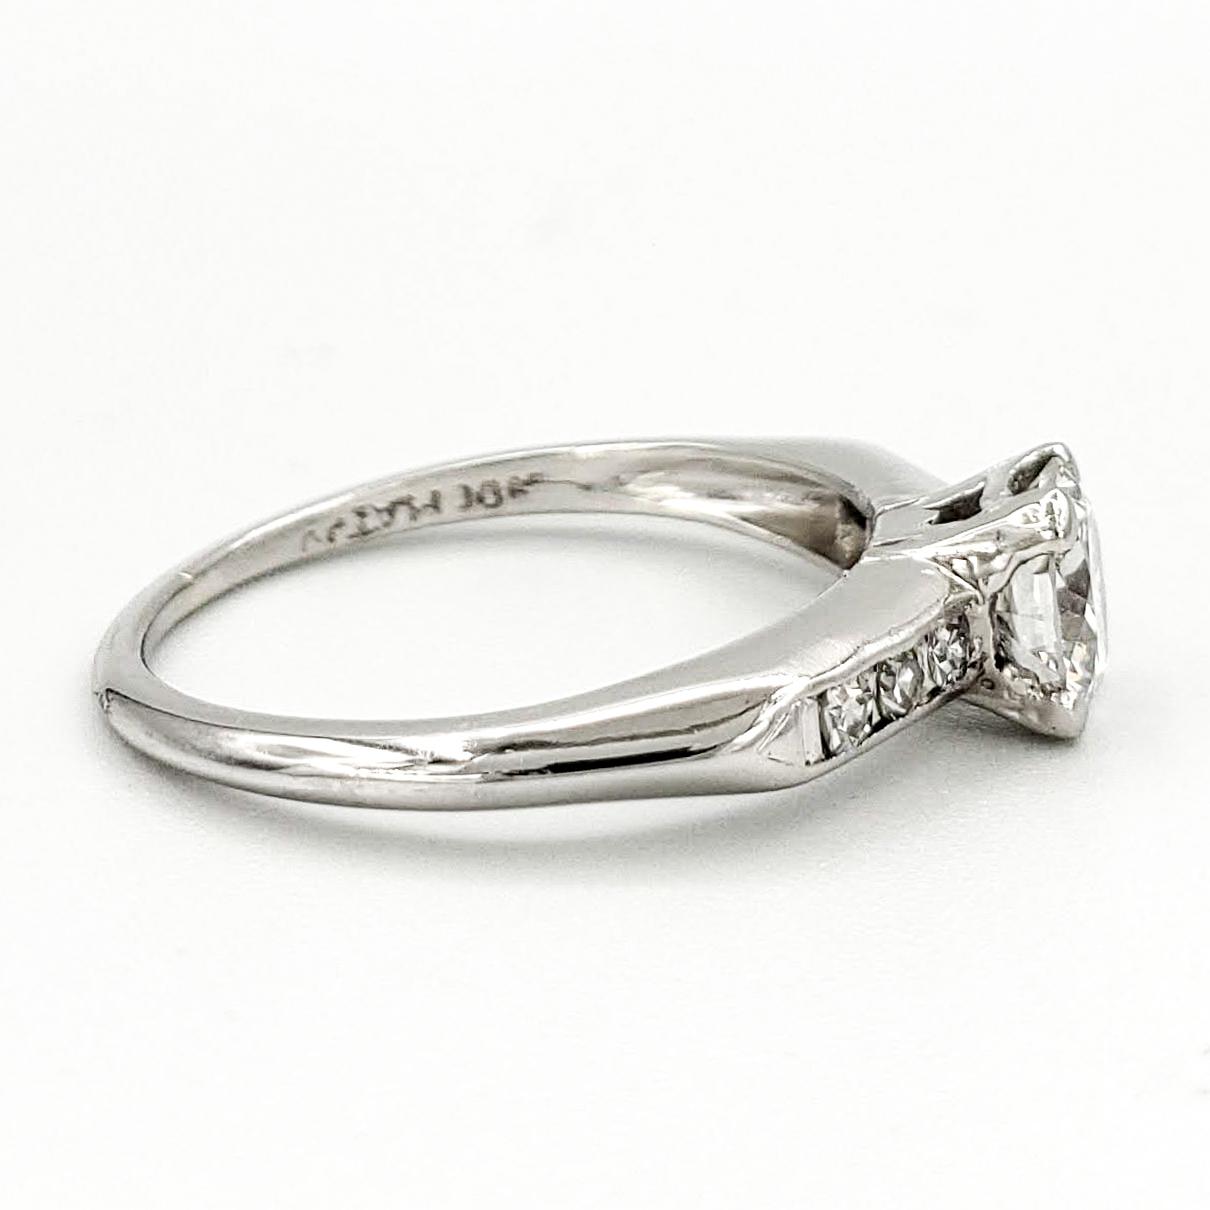 vintage-platinum-engagement-ring-with-0-45-carat-round-brilliant-cut-diamond-egl-d-vs1